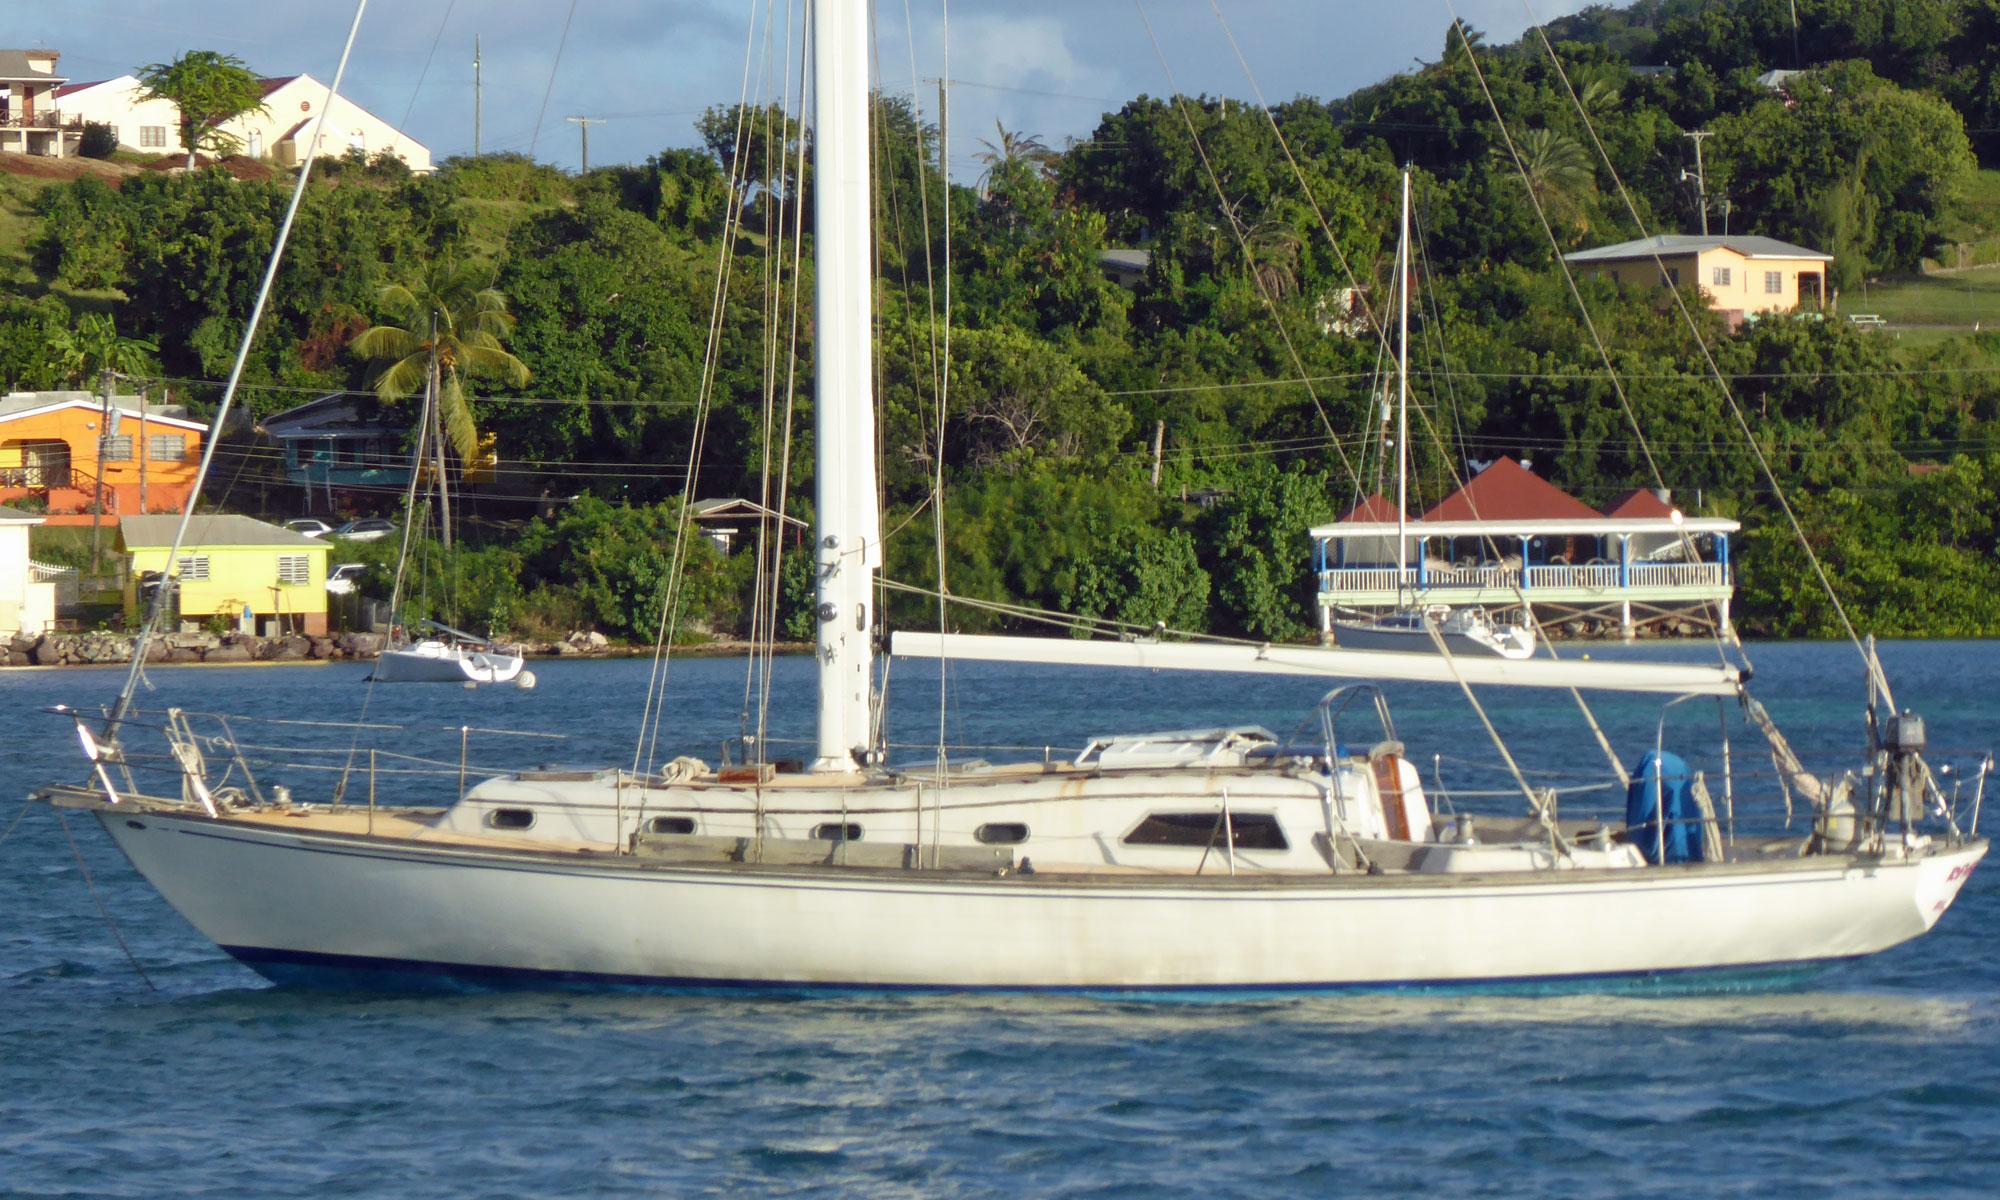 An Islander 44 sailboat